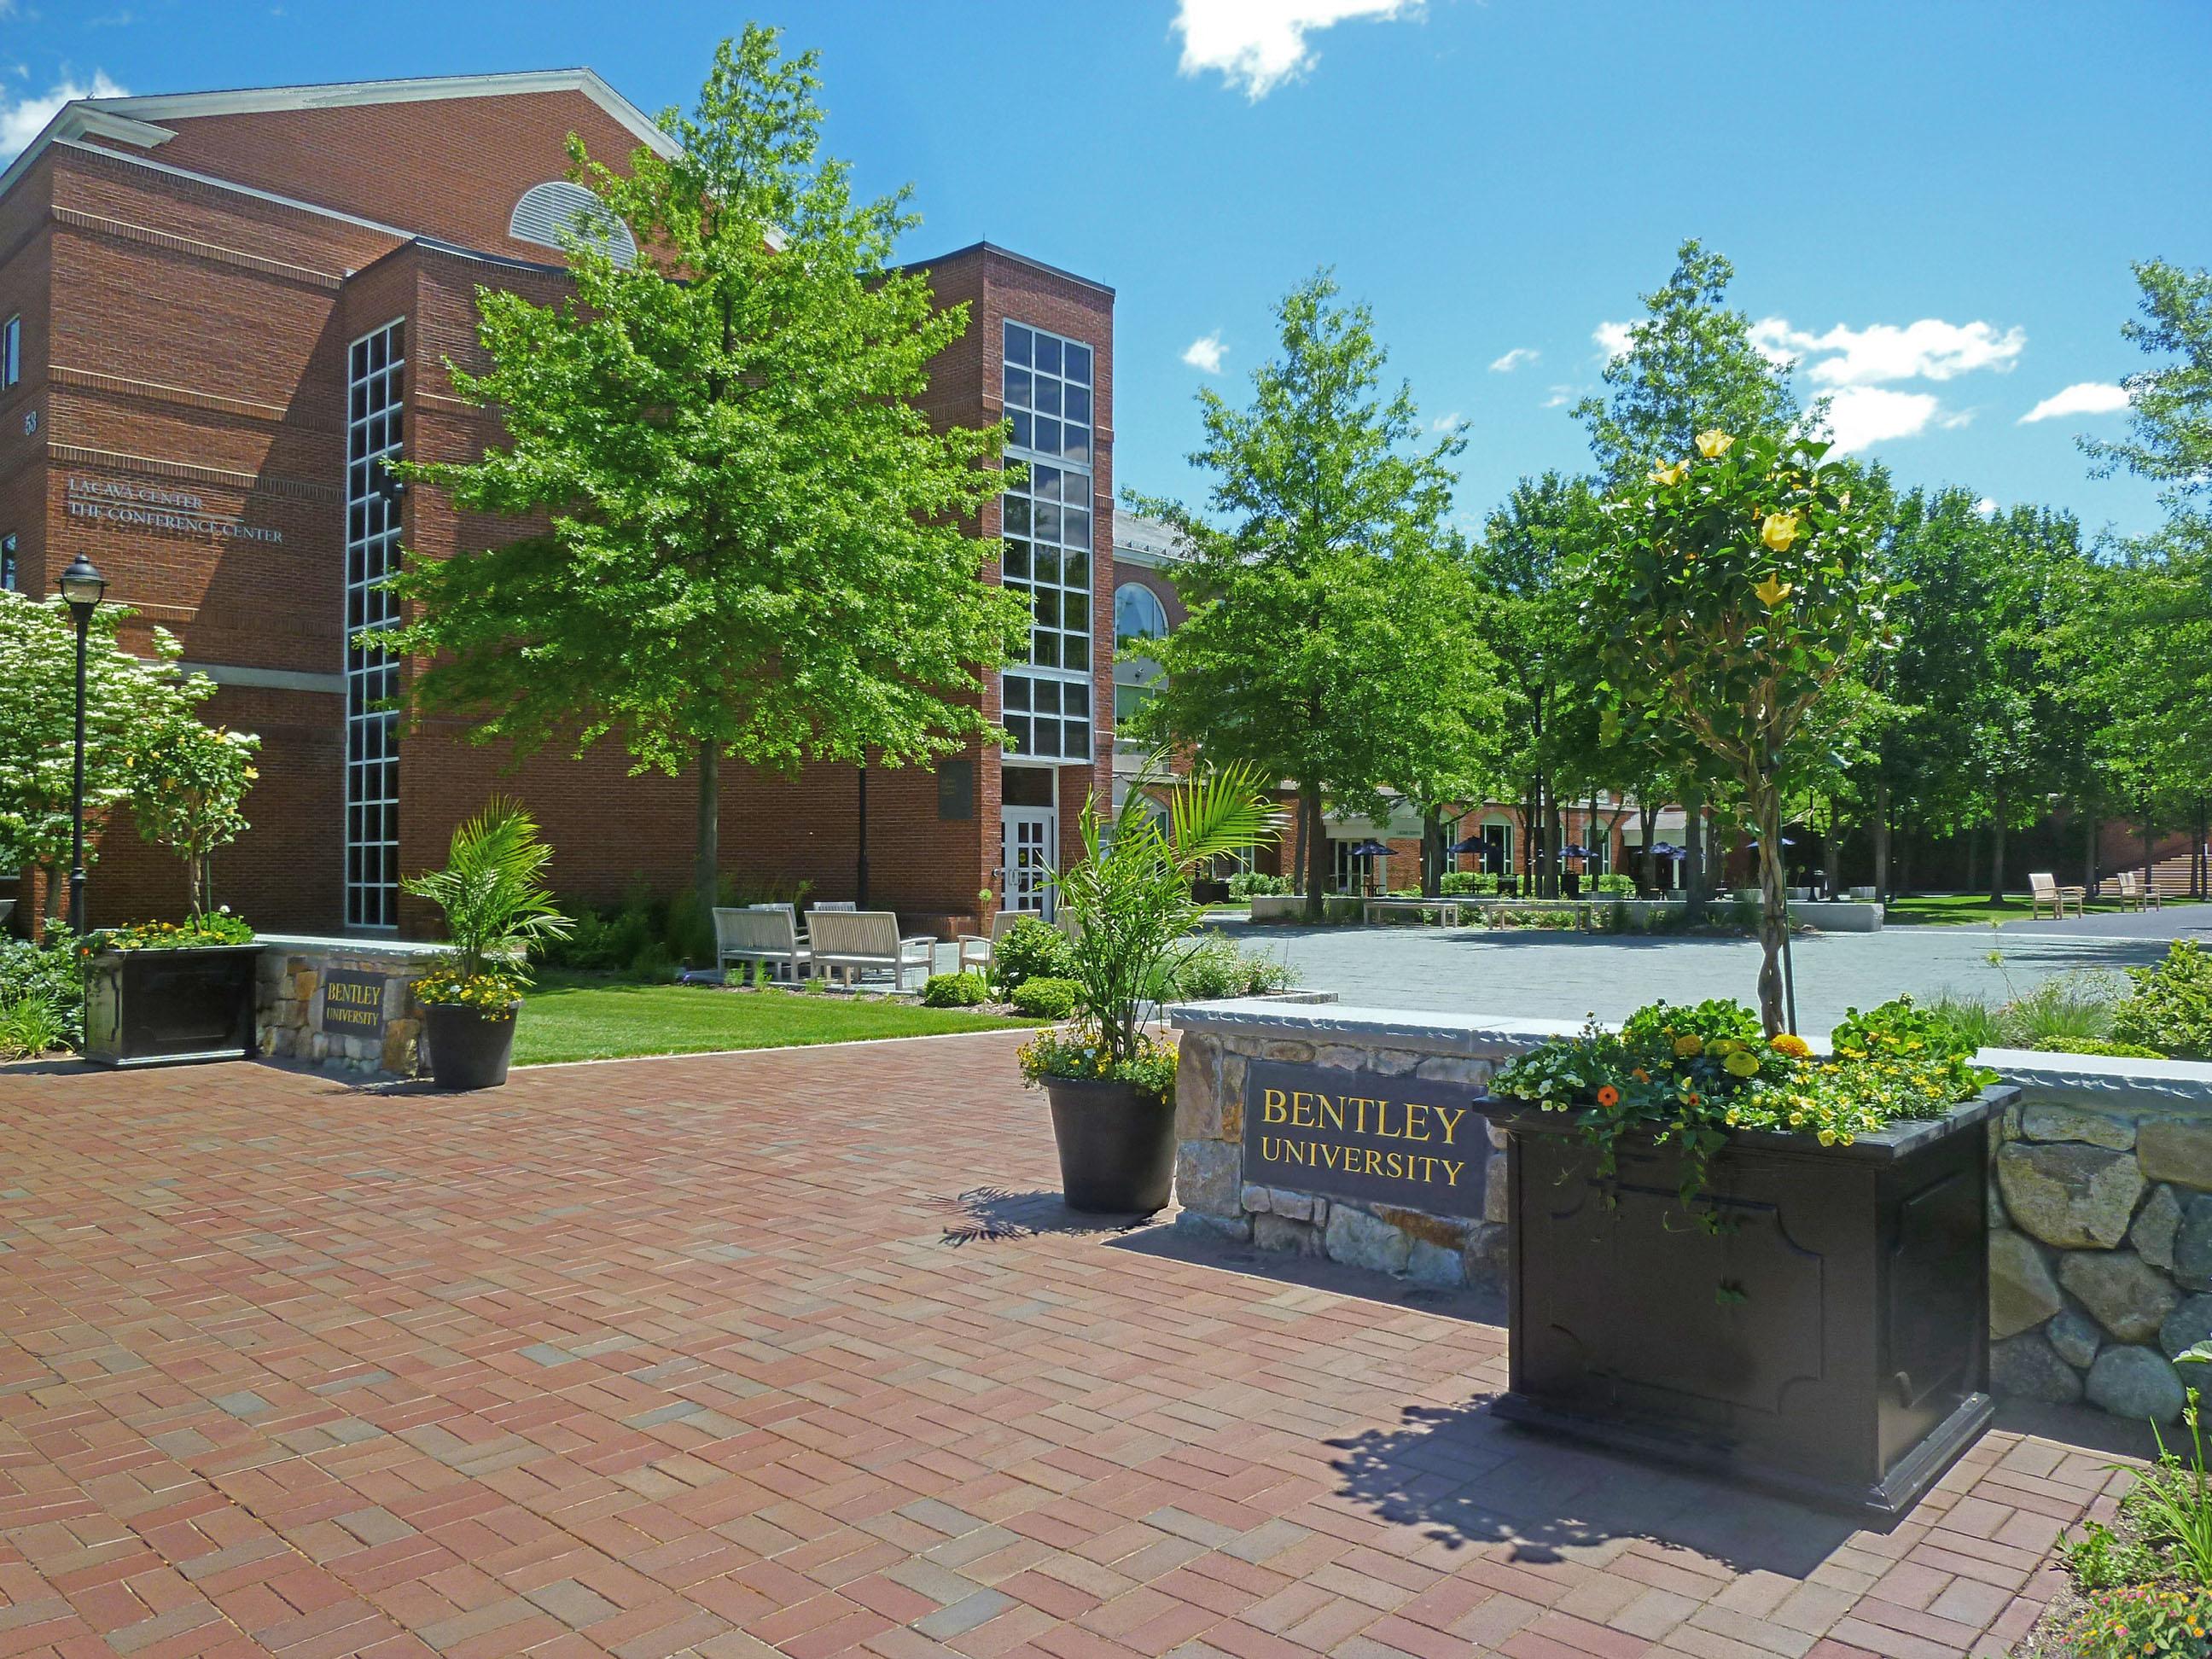 Bentley University Campus Entry Plaza Warner Larson